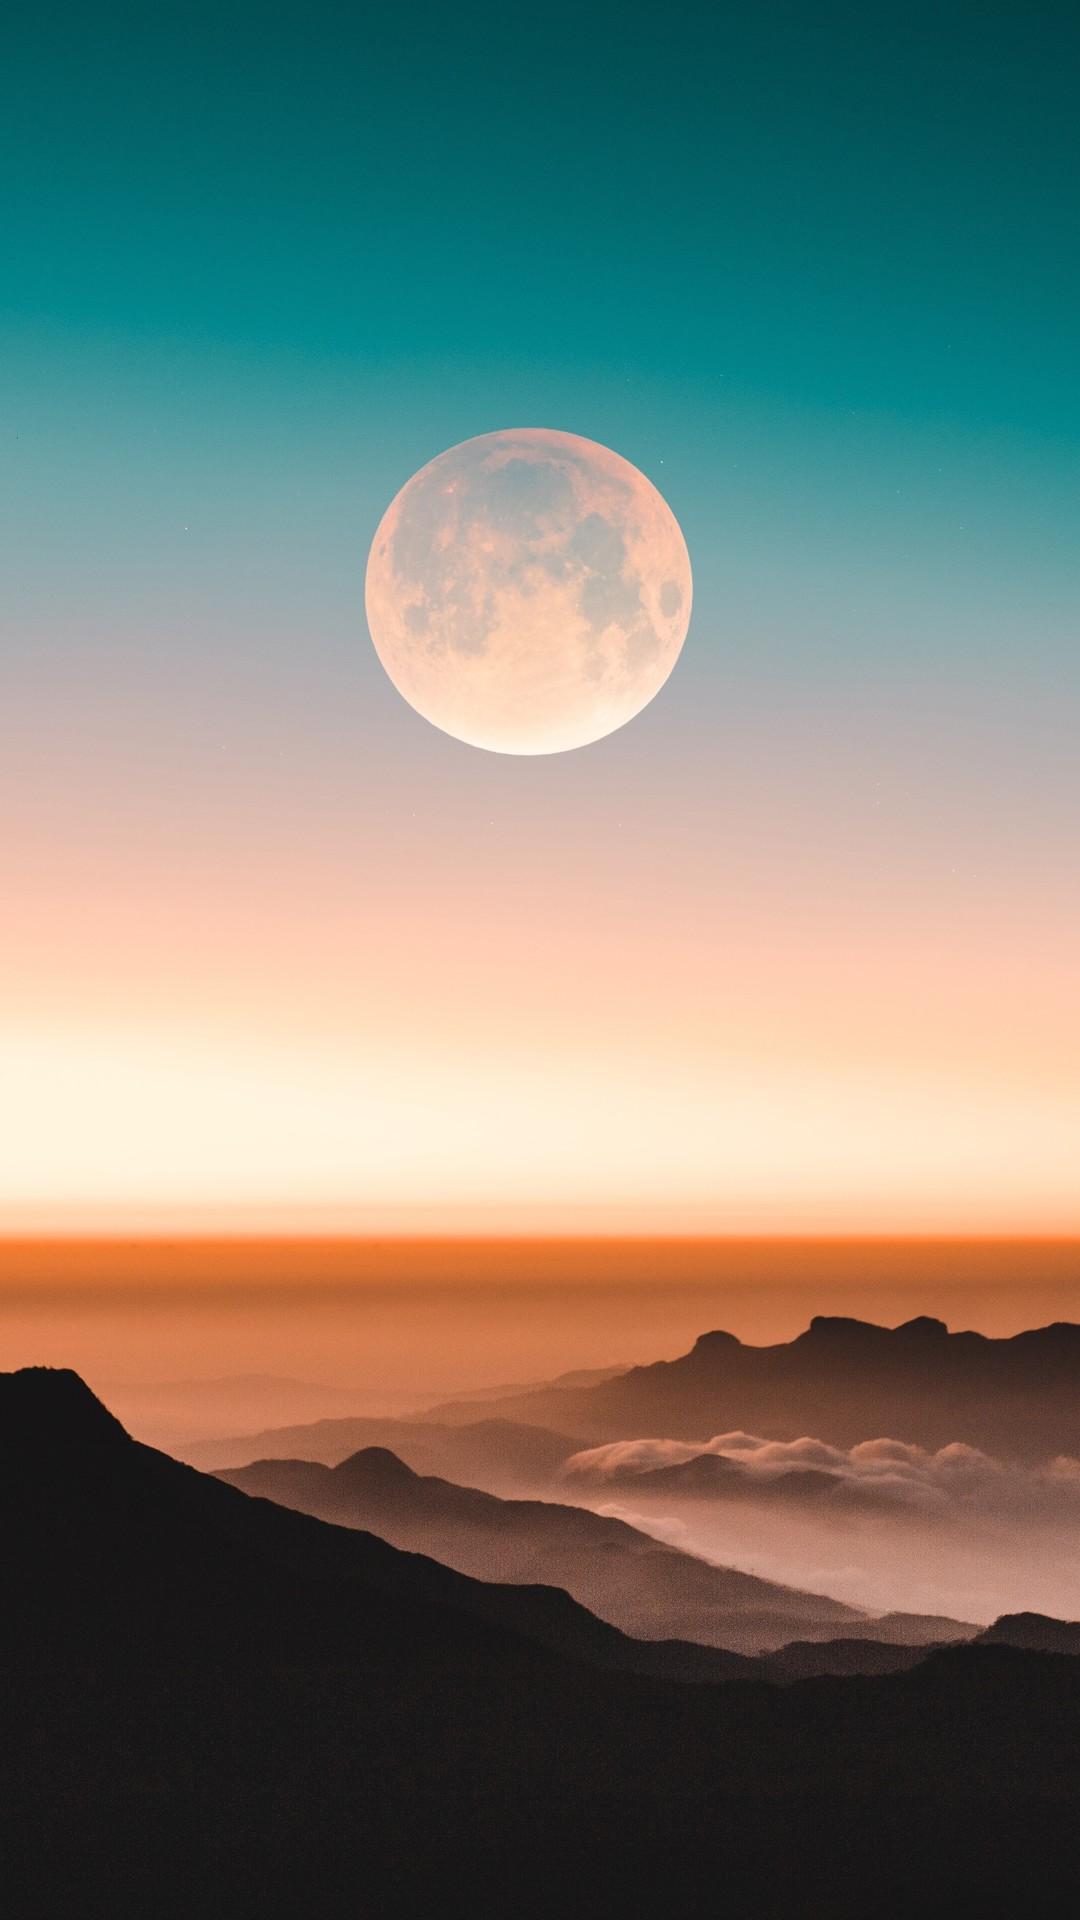 Adams Peak Mountains iPhone Wallpaper